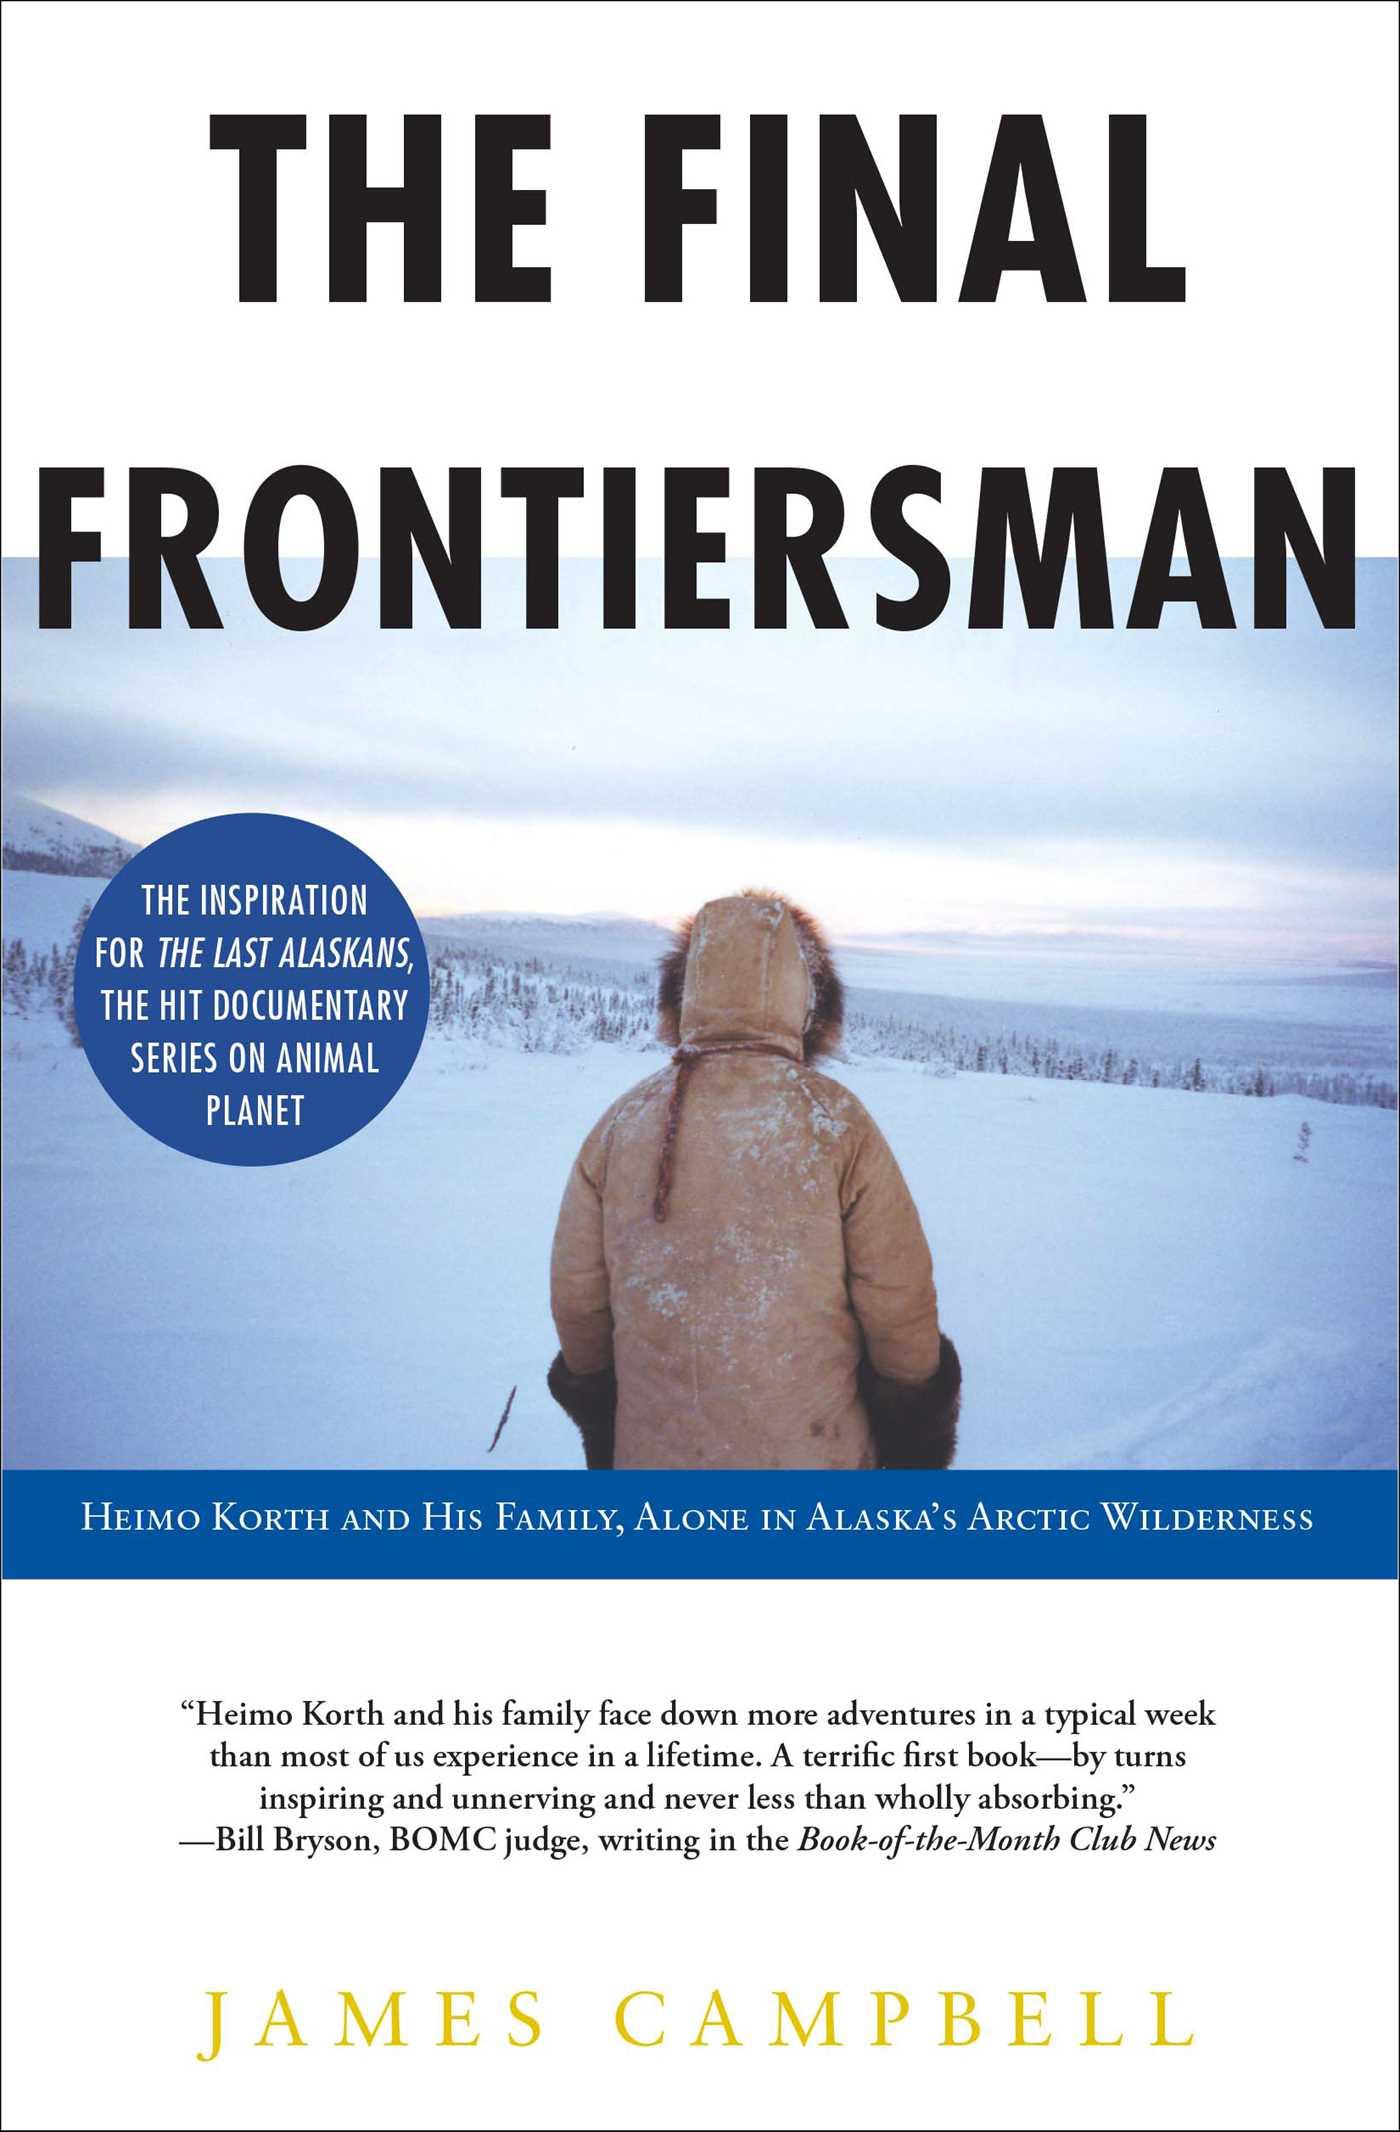 The final frontiersman 9780743453141 hr